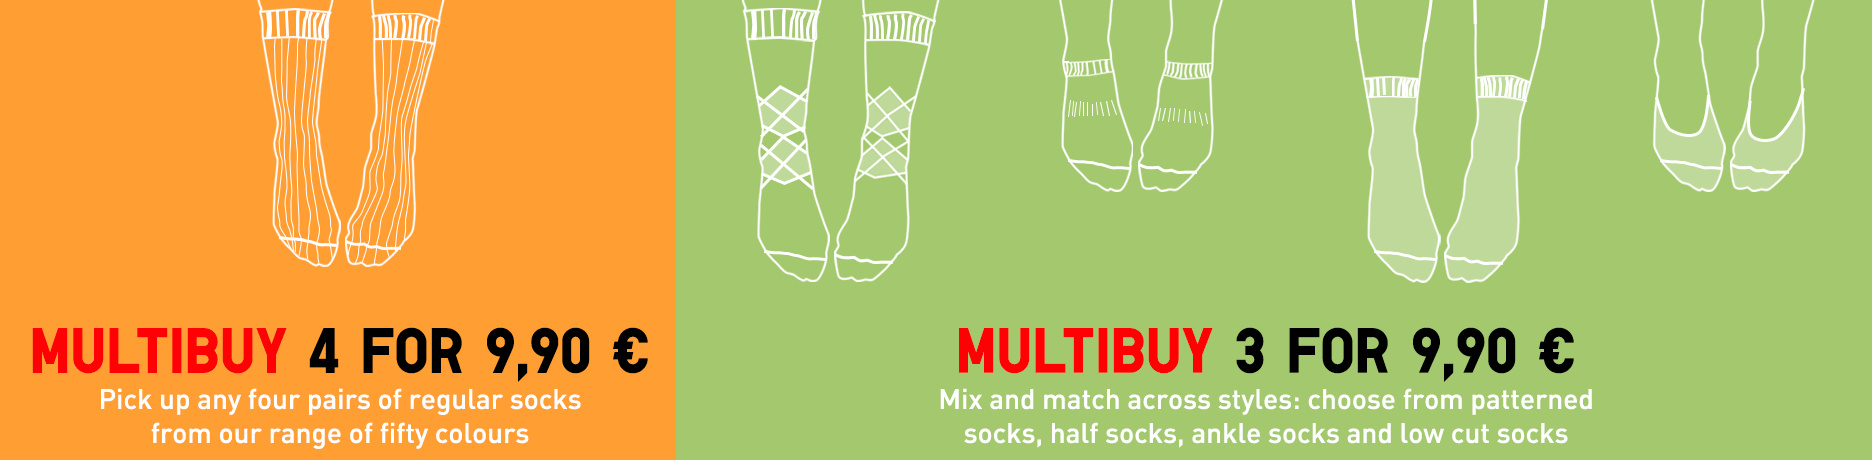 Socks Multibuy